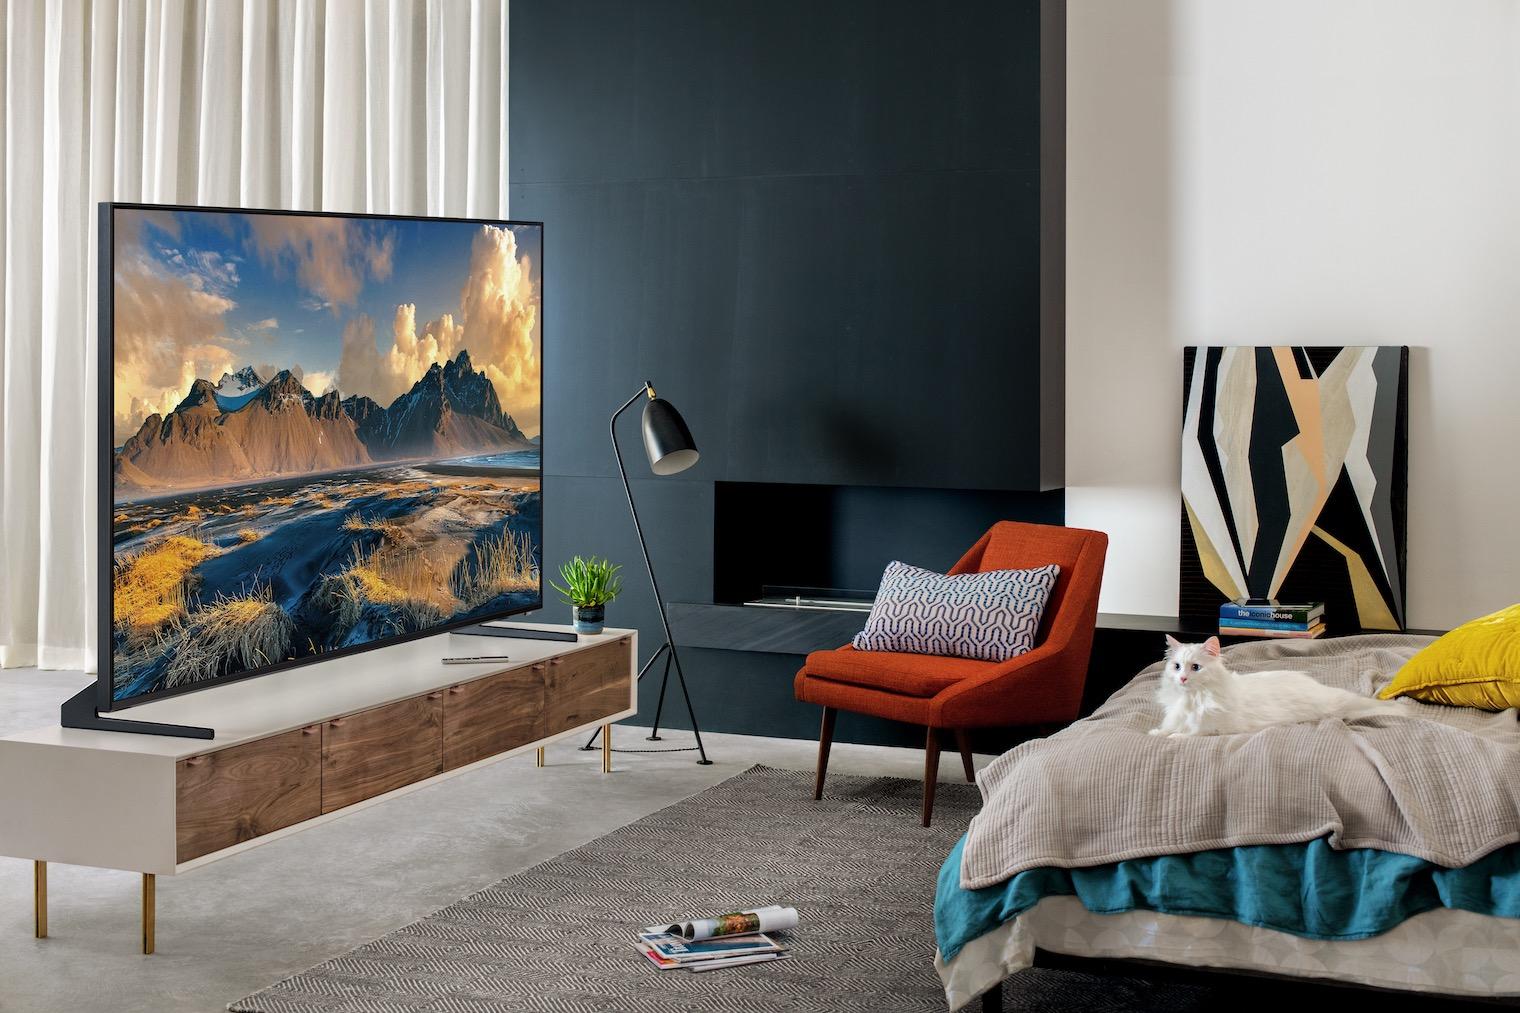 Samsung QLED 8K TV 2